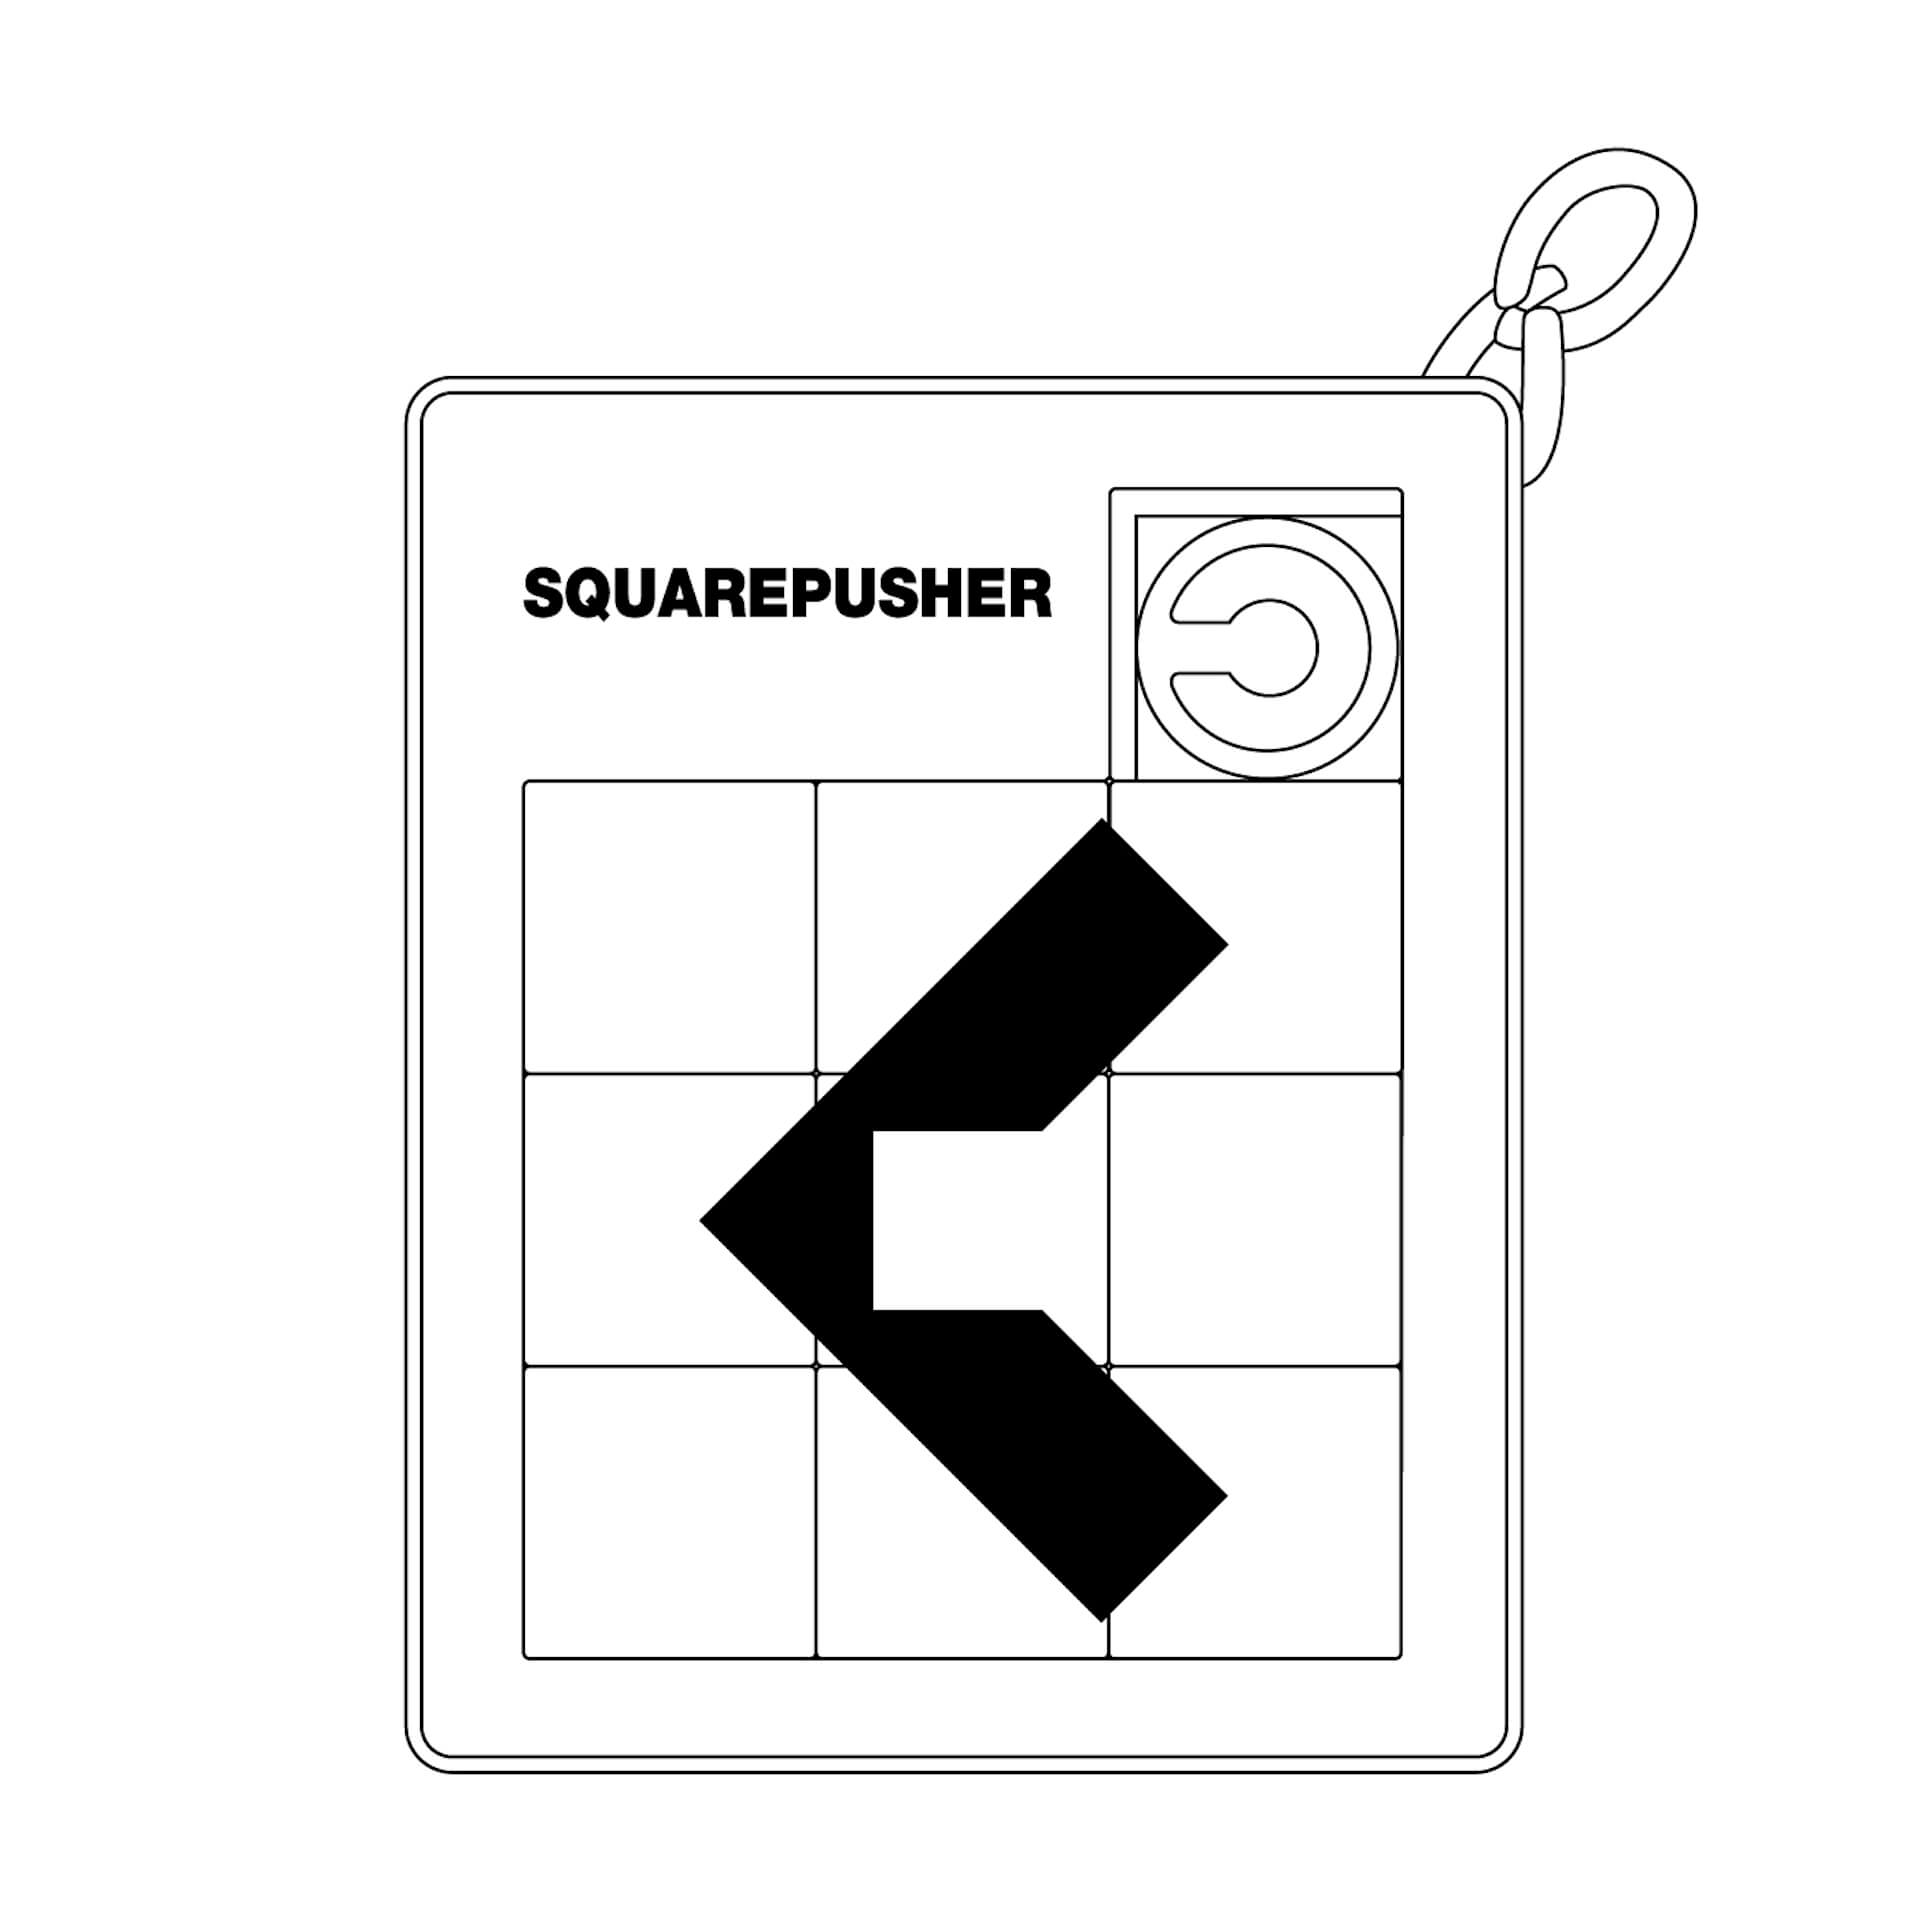 Squarepusherデビューアルバム『Feed Me Weird Things』再発盤が本日ついに発売!待望のサブスクも解禁 music210604_squarepusher_2